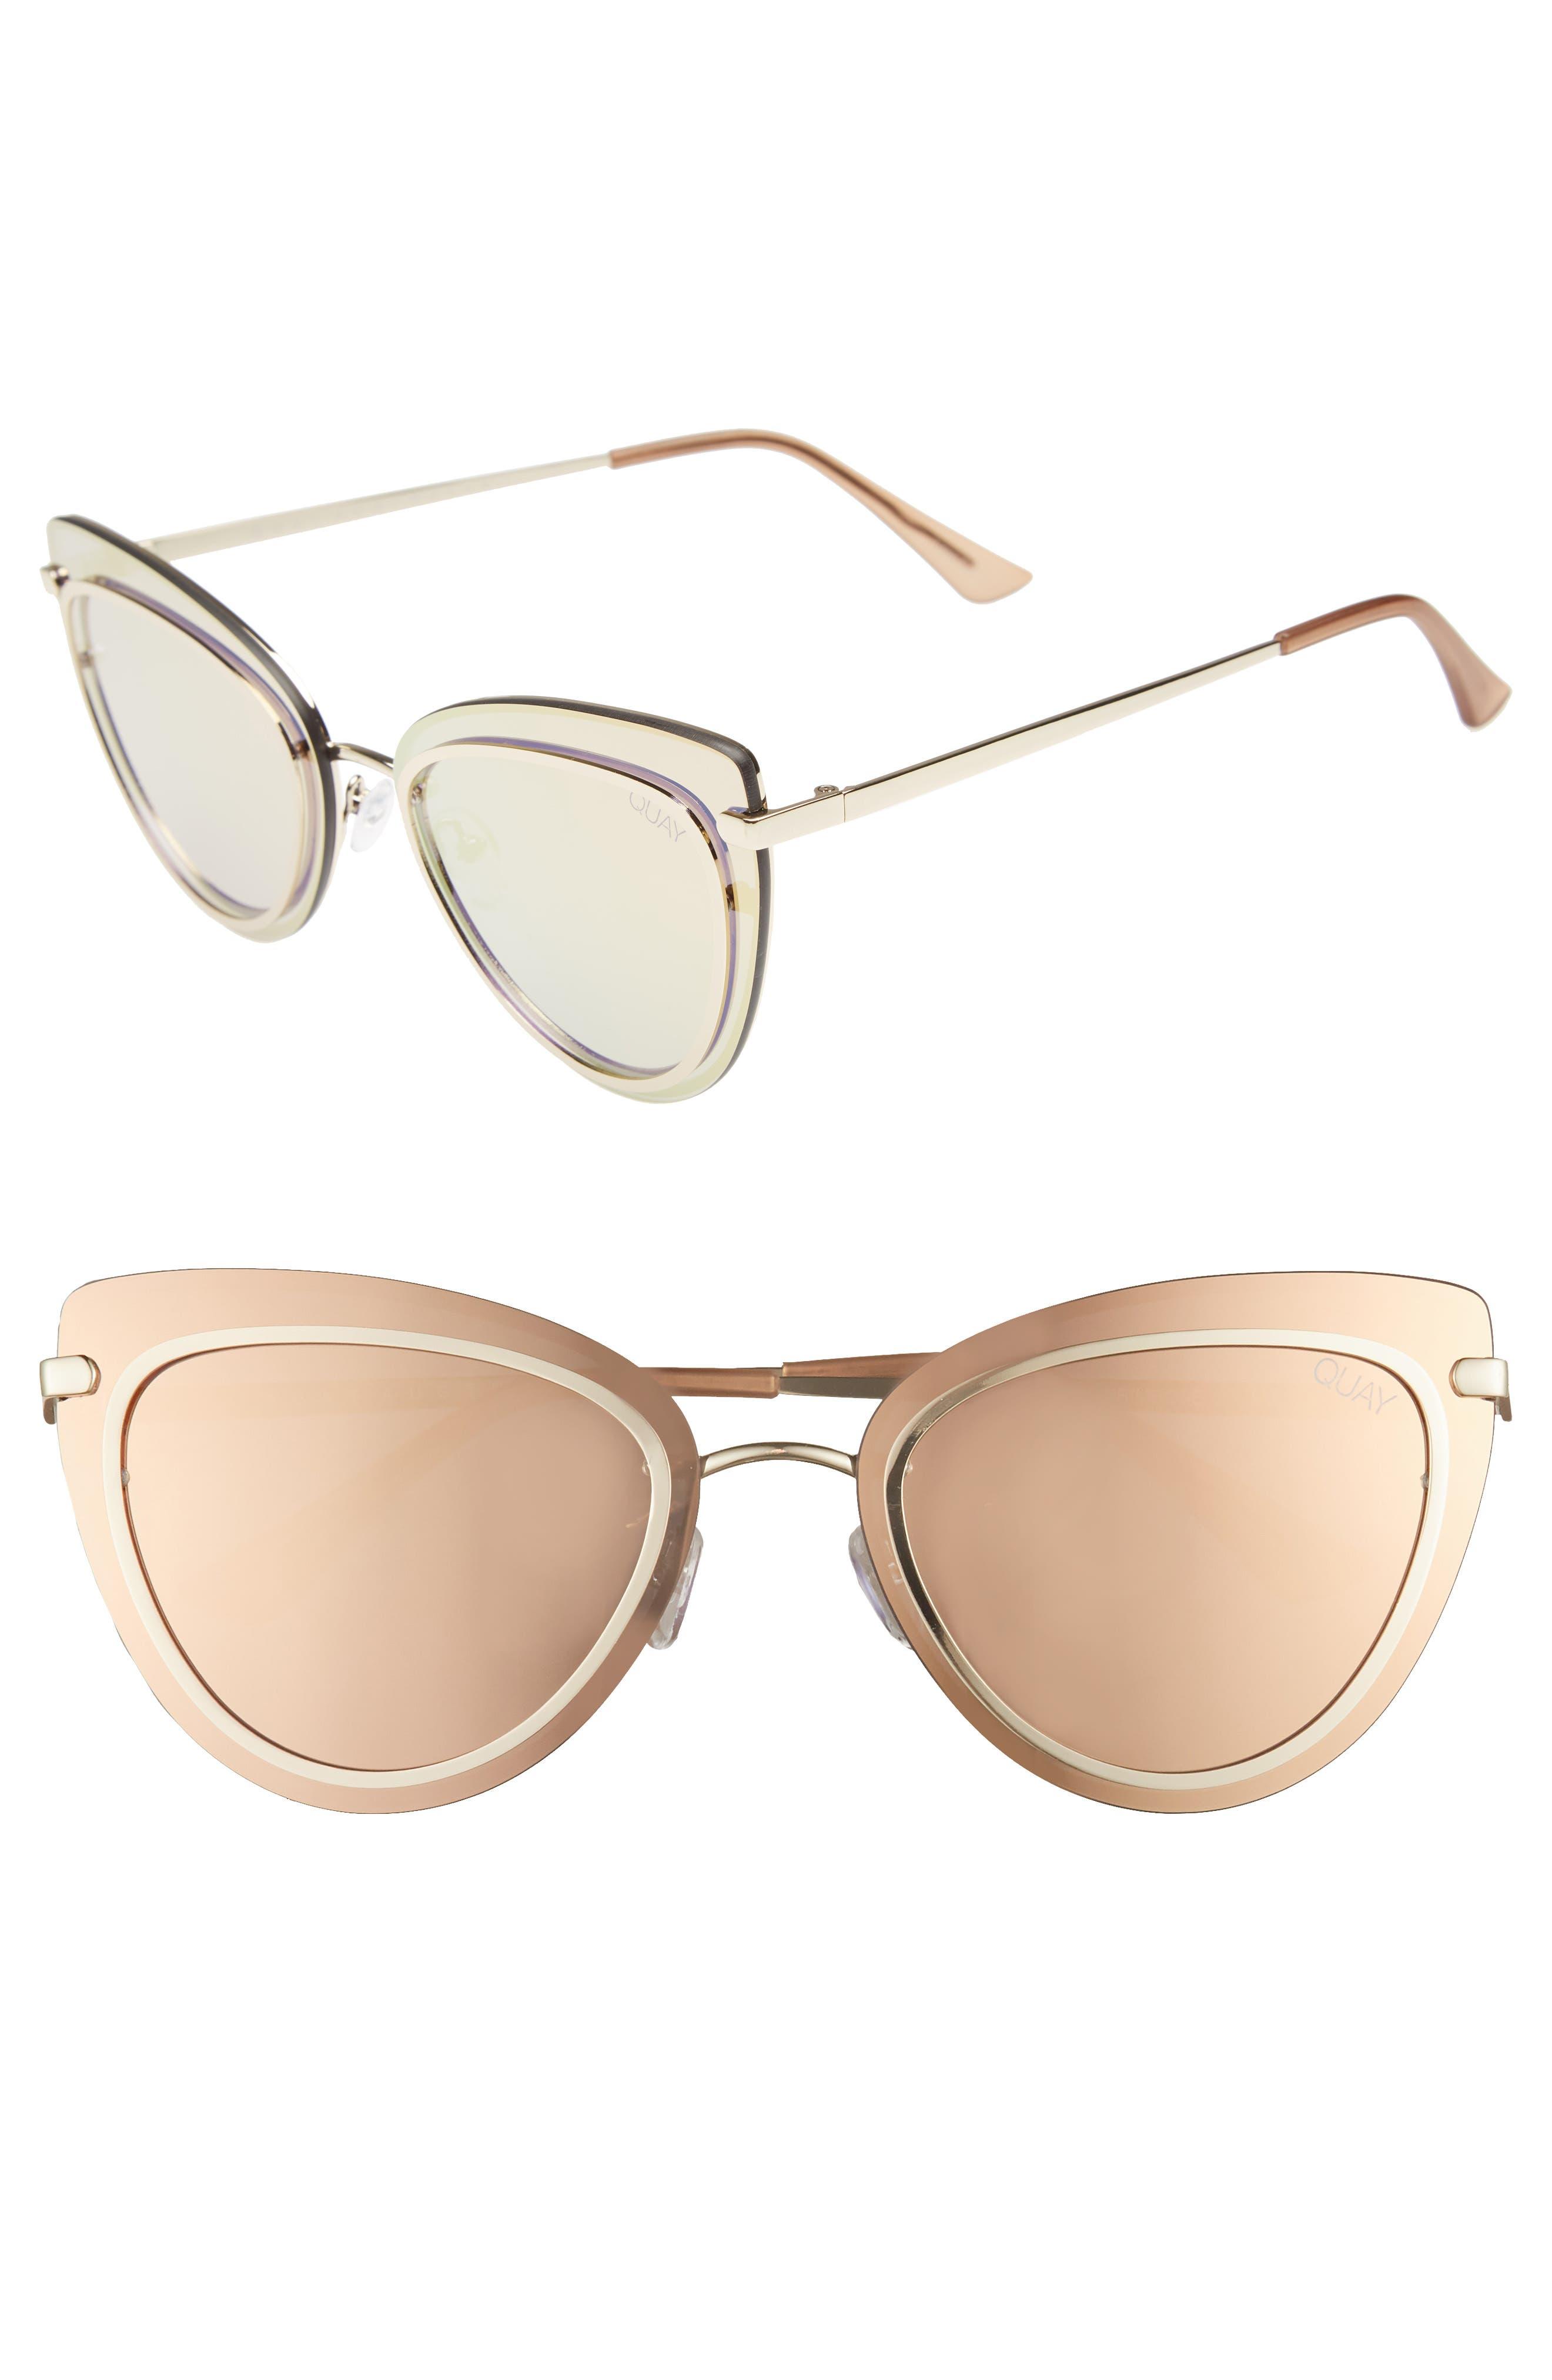 Primrose 55mm Cat Eye Sunglasses,                             Main thumbnail 1, color,                             GOLD/ ROSE